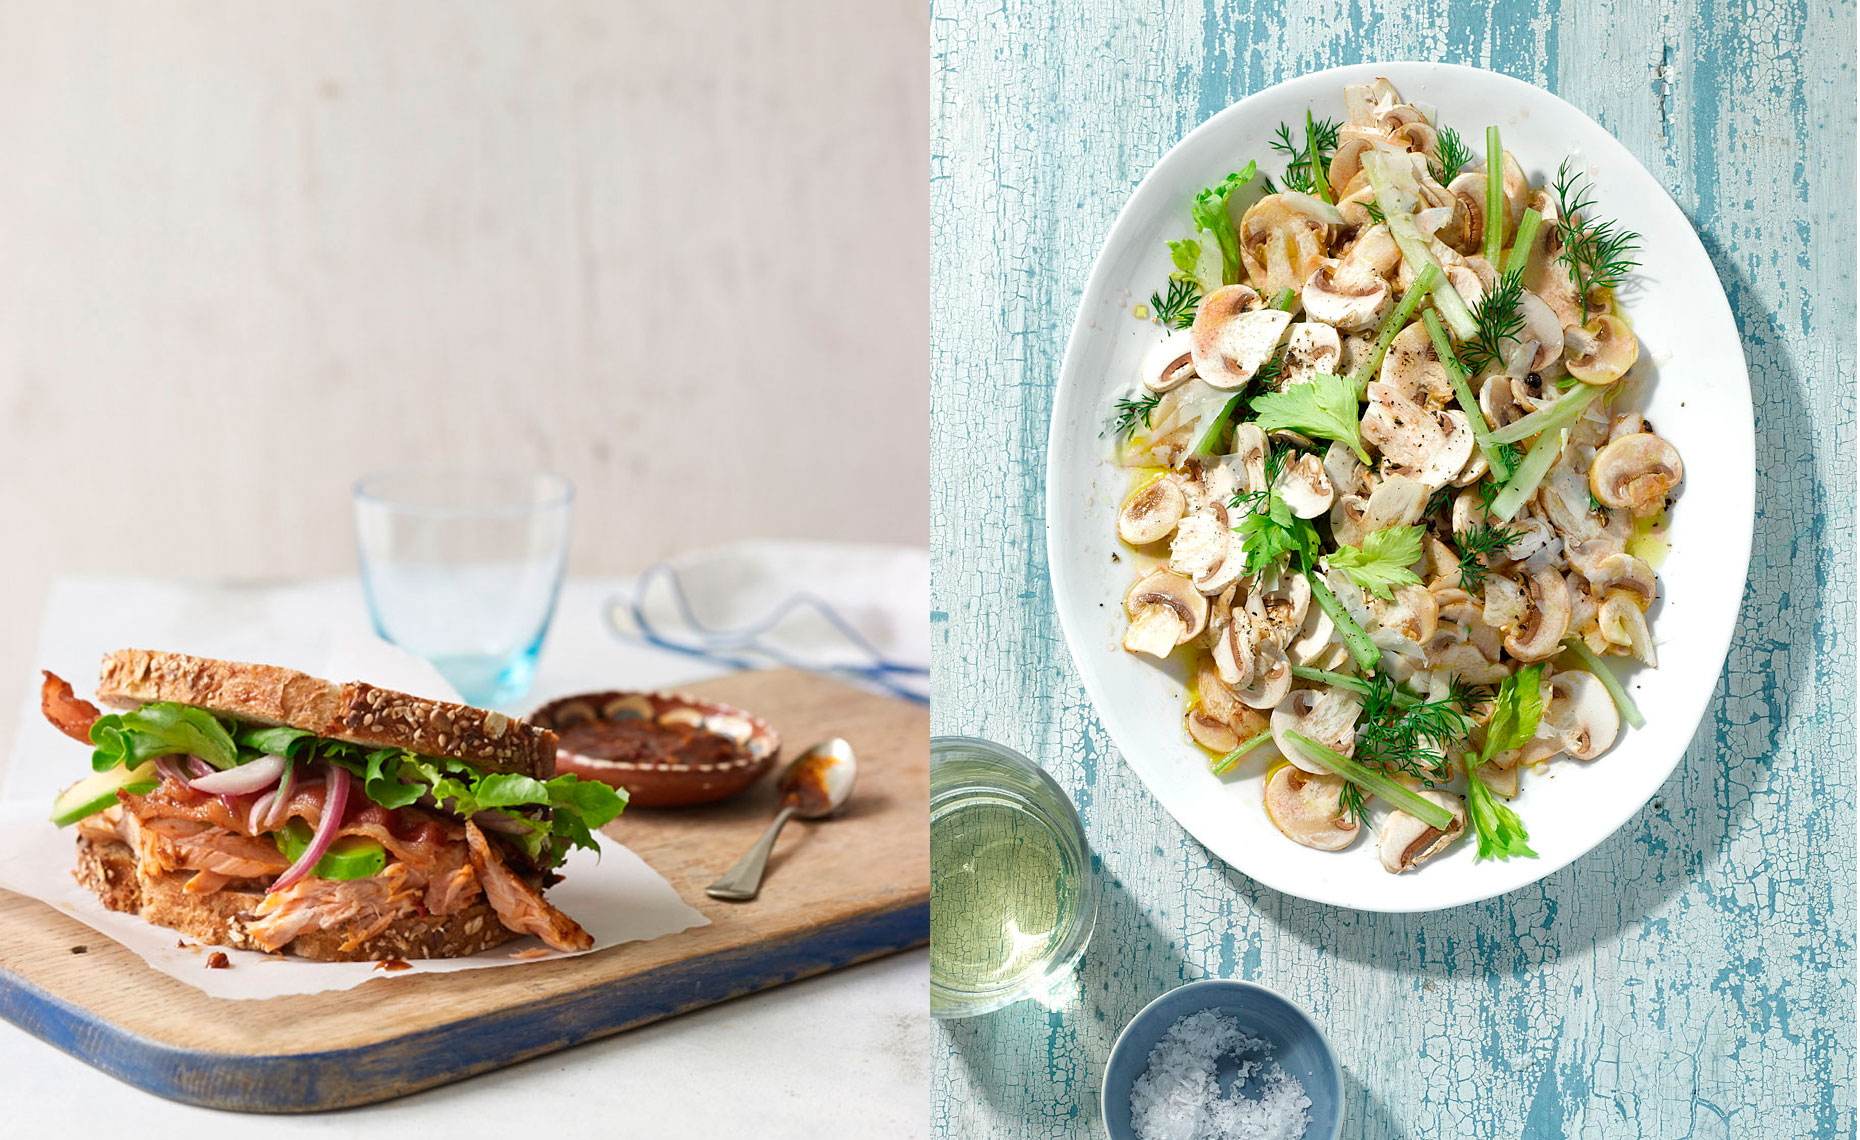 tuna-sandwich-and-mushroom-celery-salad.jpg